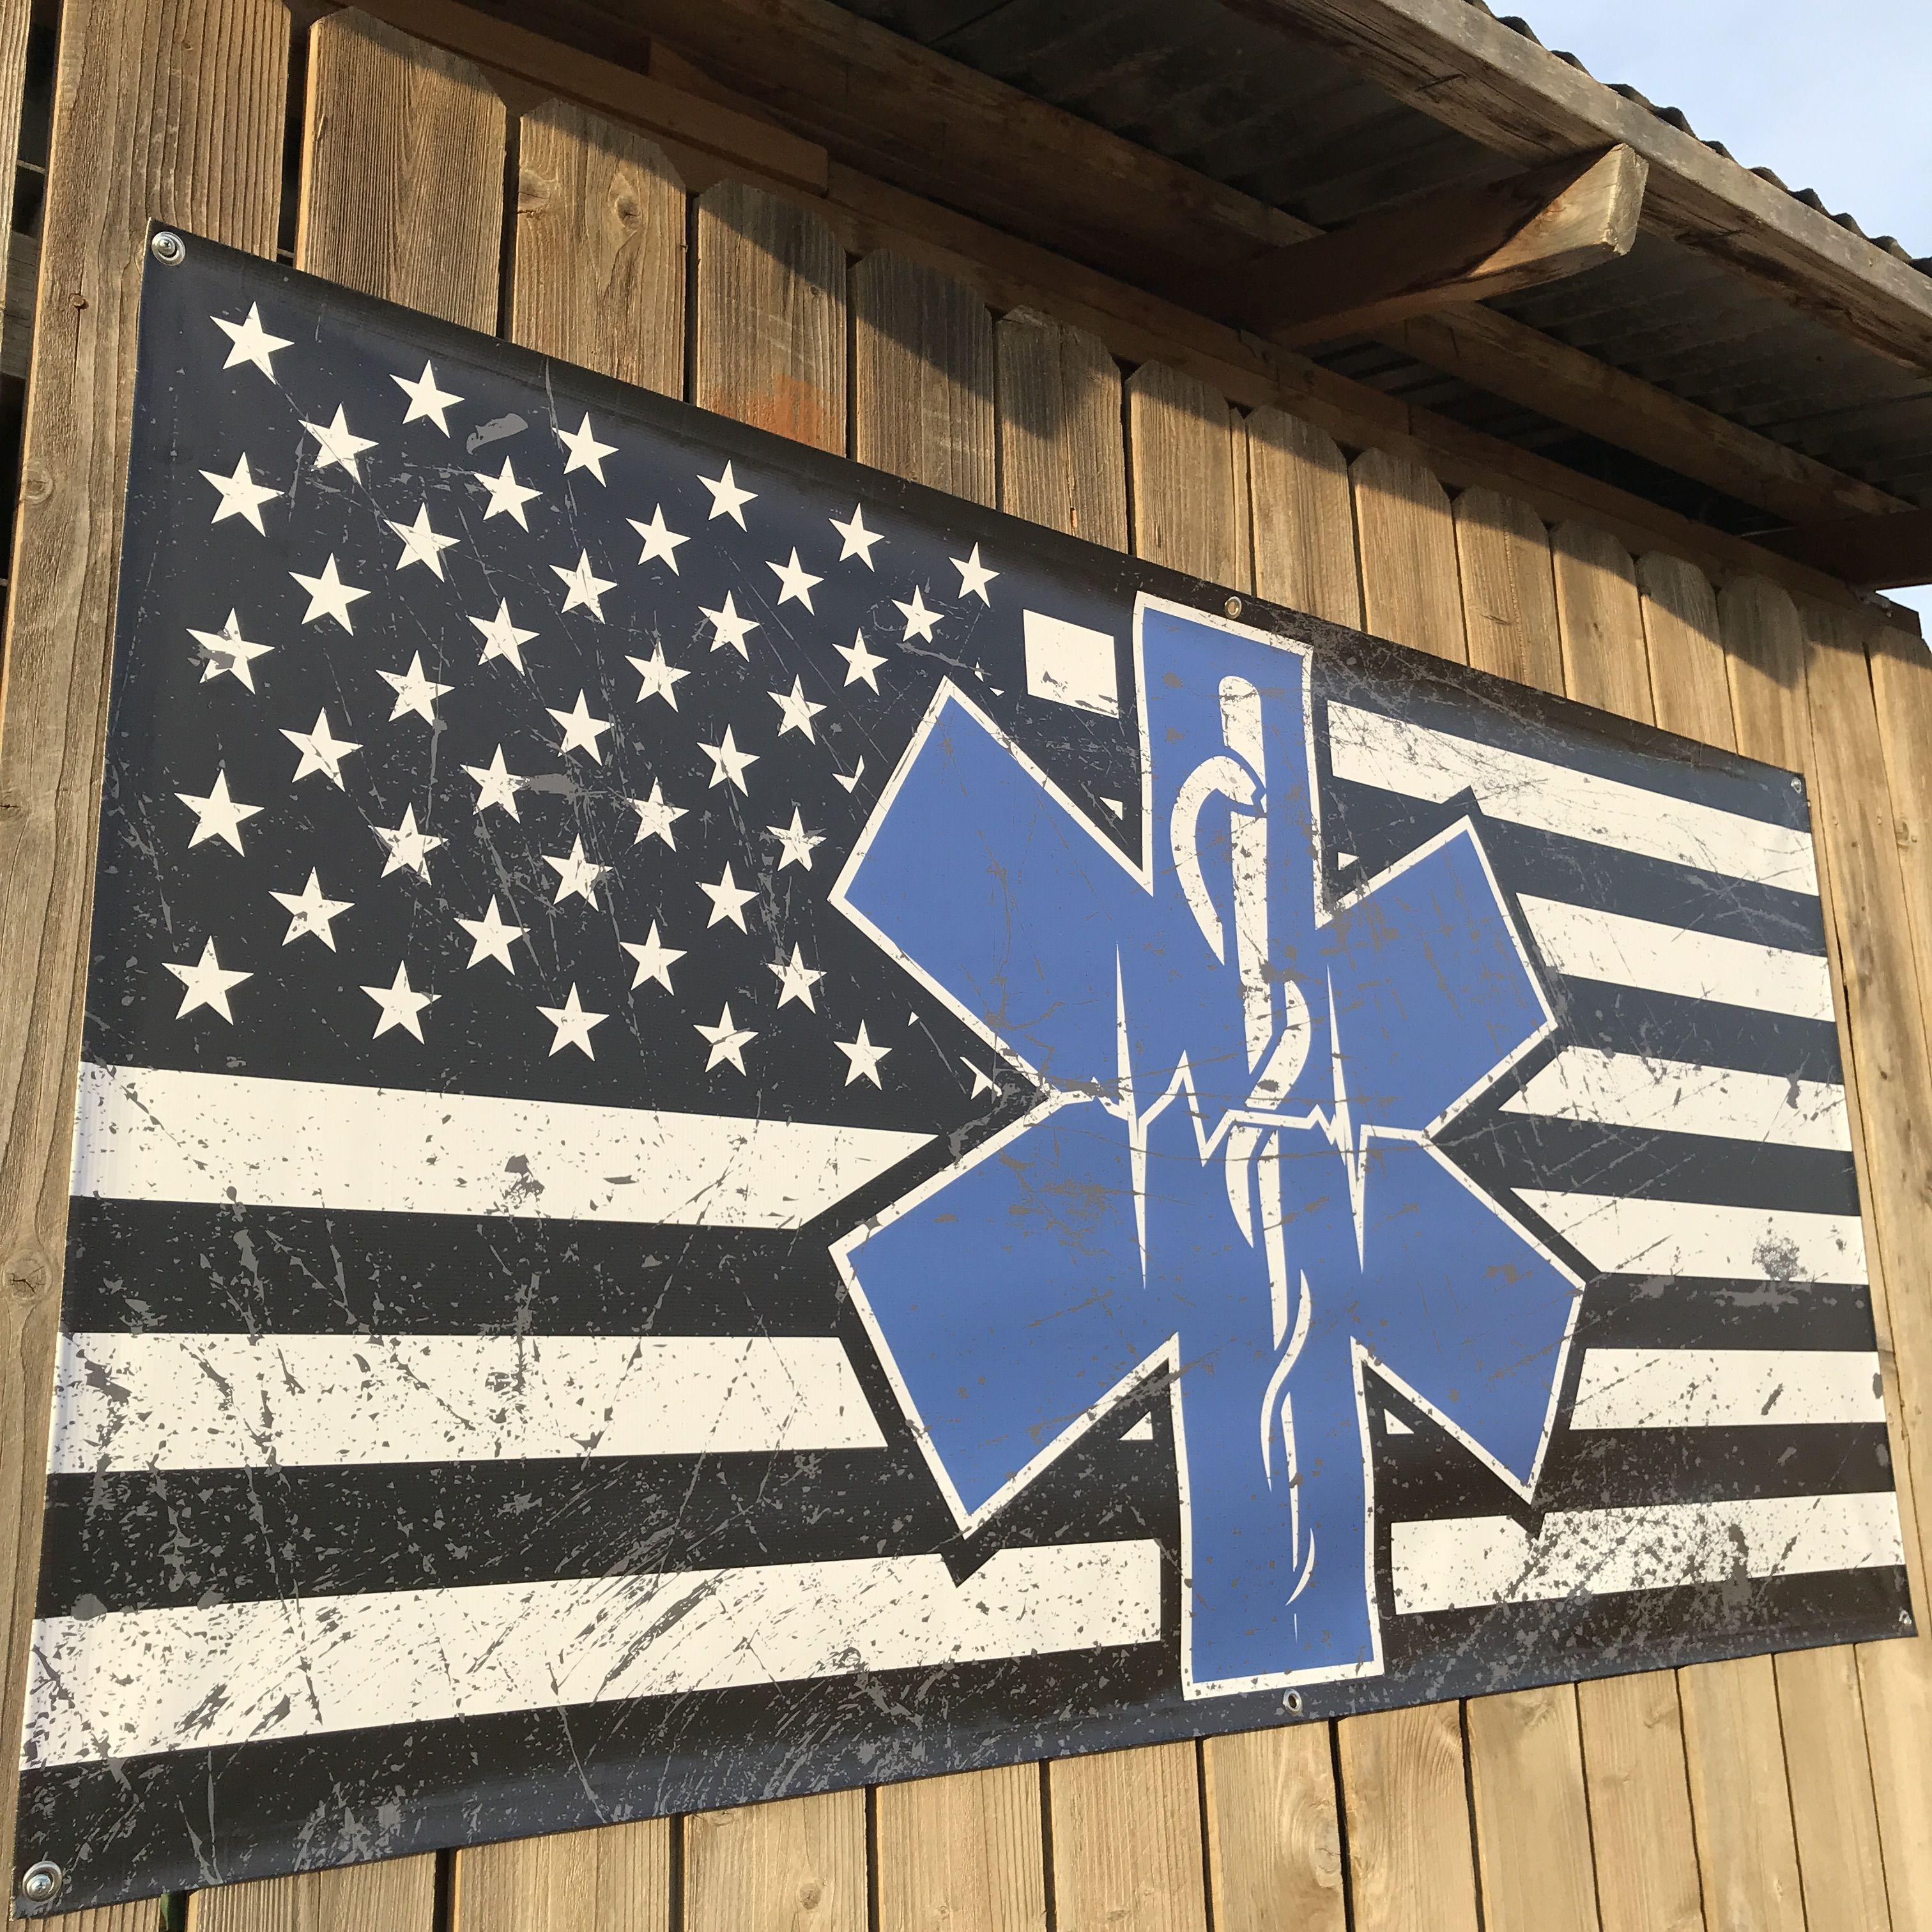 Distressed Paramedic Emt Ems Star Of Life Flag Banners Www Lstarsigns Com Lonestarsigns Lonestararmy Emt Ems Emtlife E Anerican Flag Flag Banners Banner